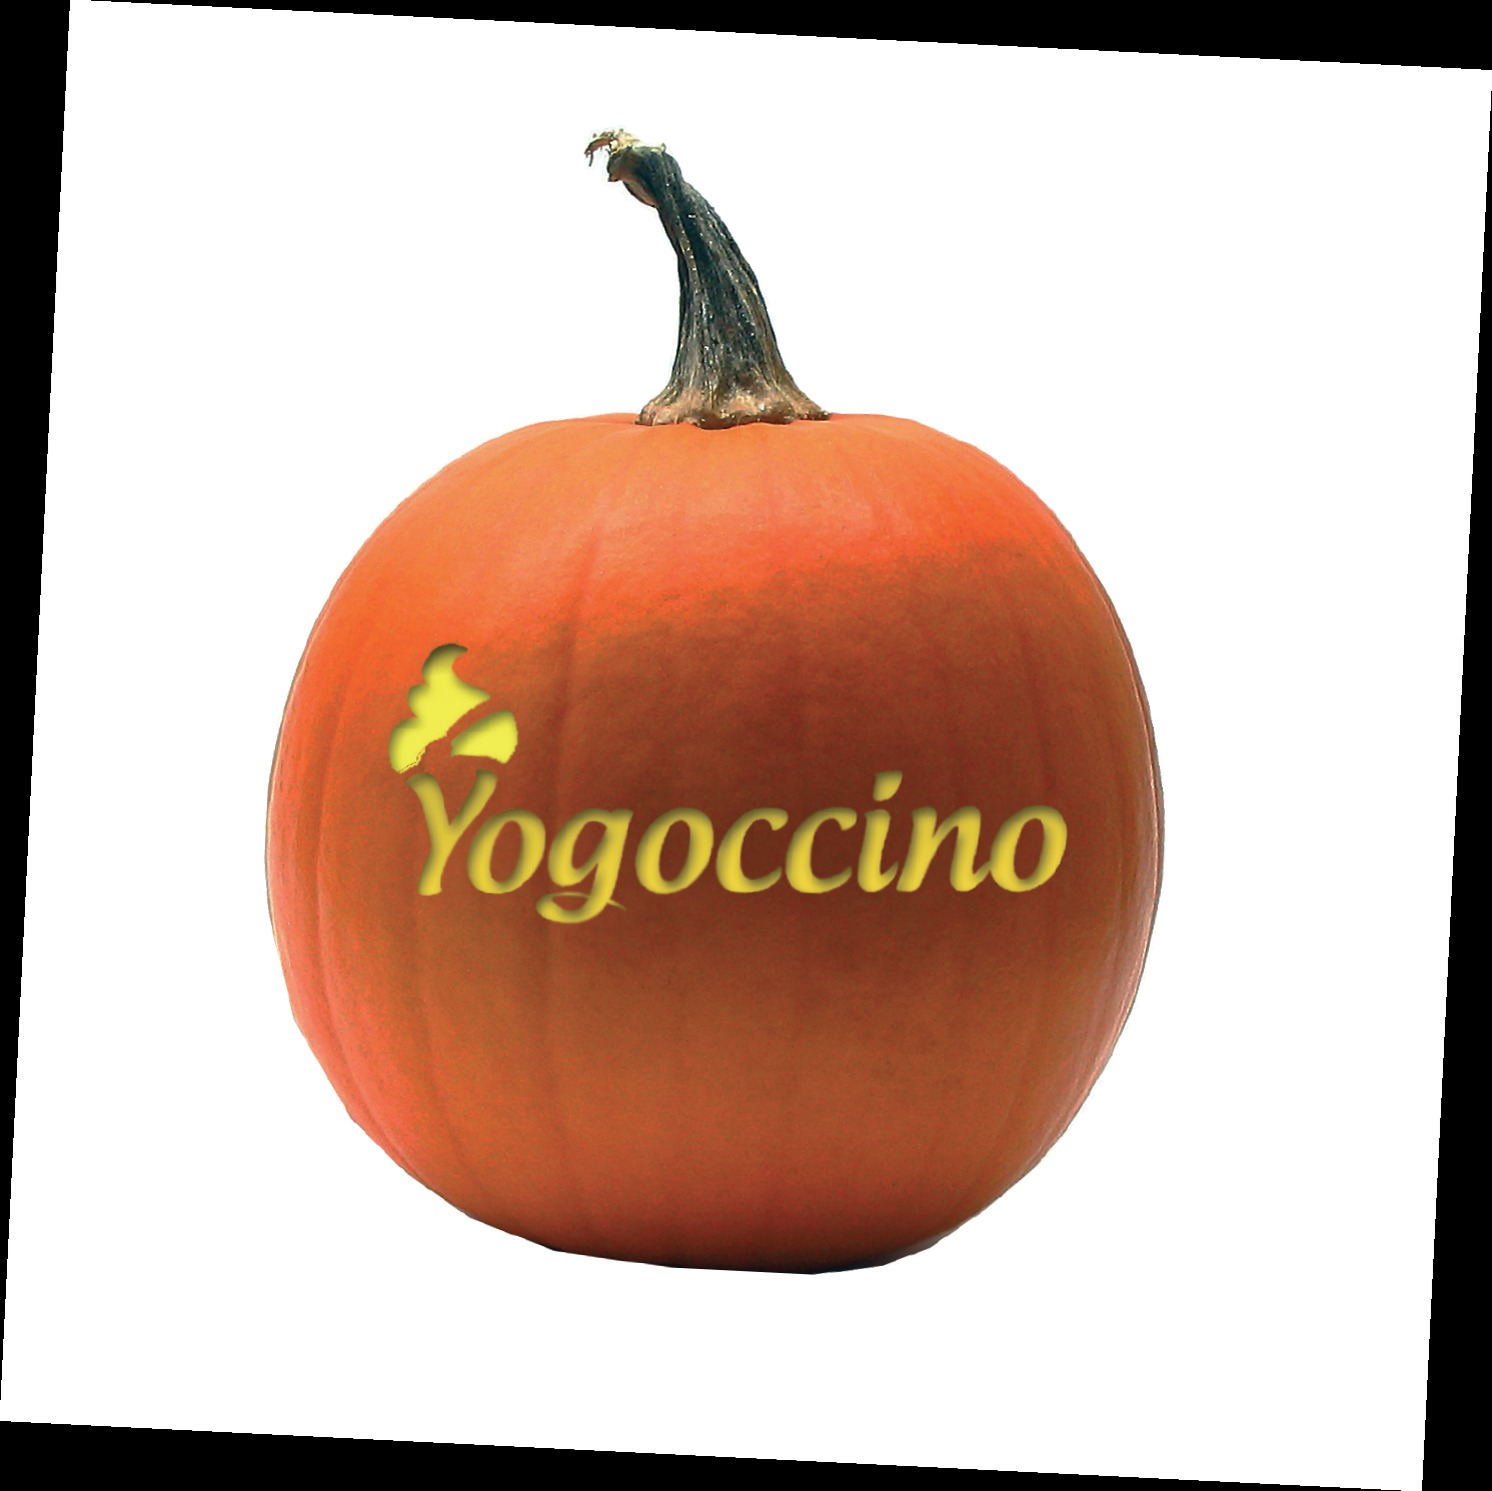 b313e0cc6b2e3e21c1d2_Yogoccino_Halloween_Pic.png